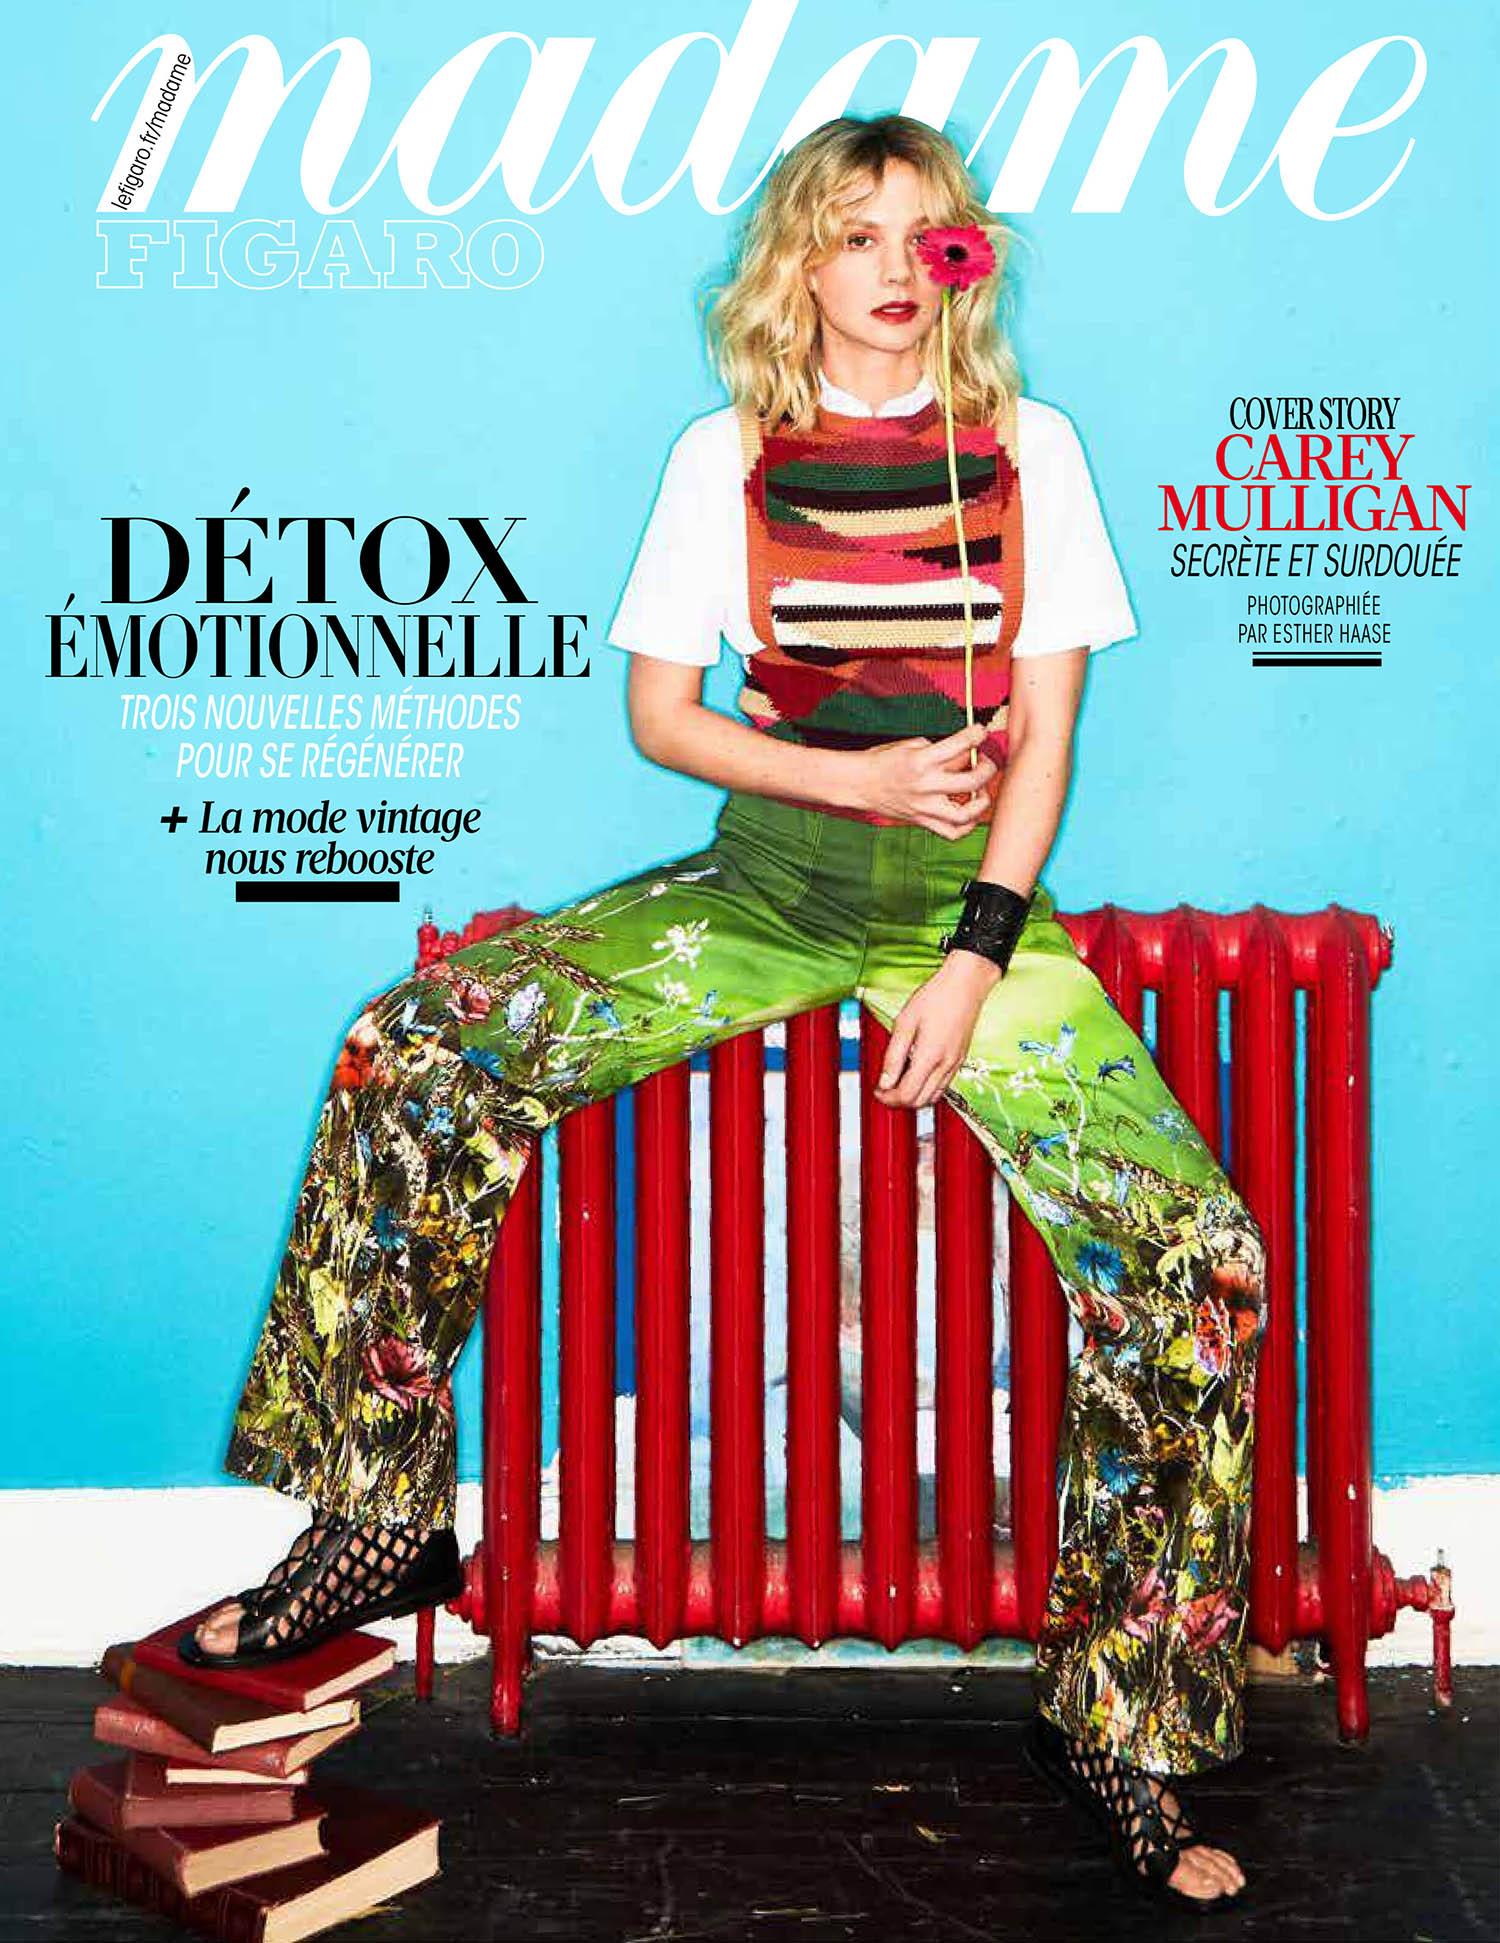 Carey Mulligan, Madame Magazine